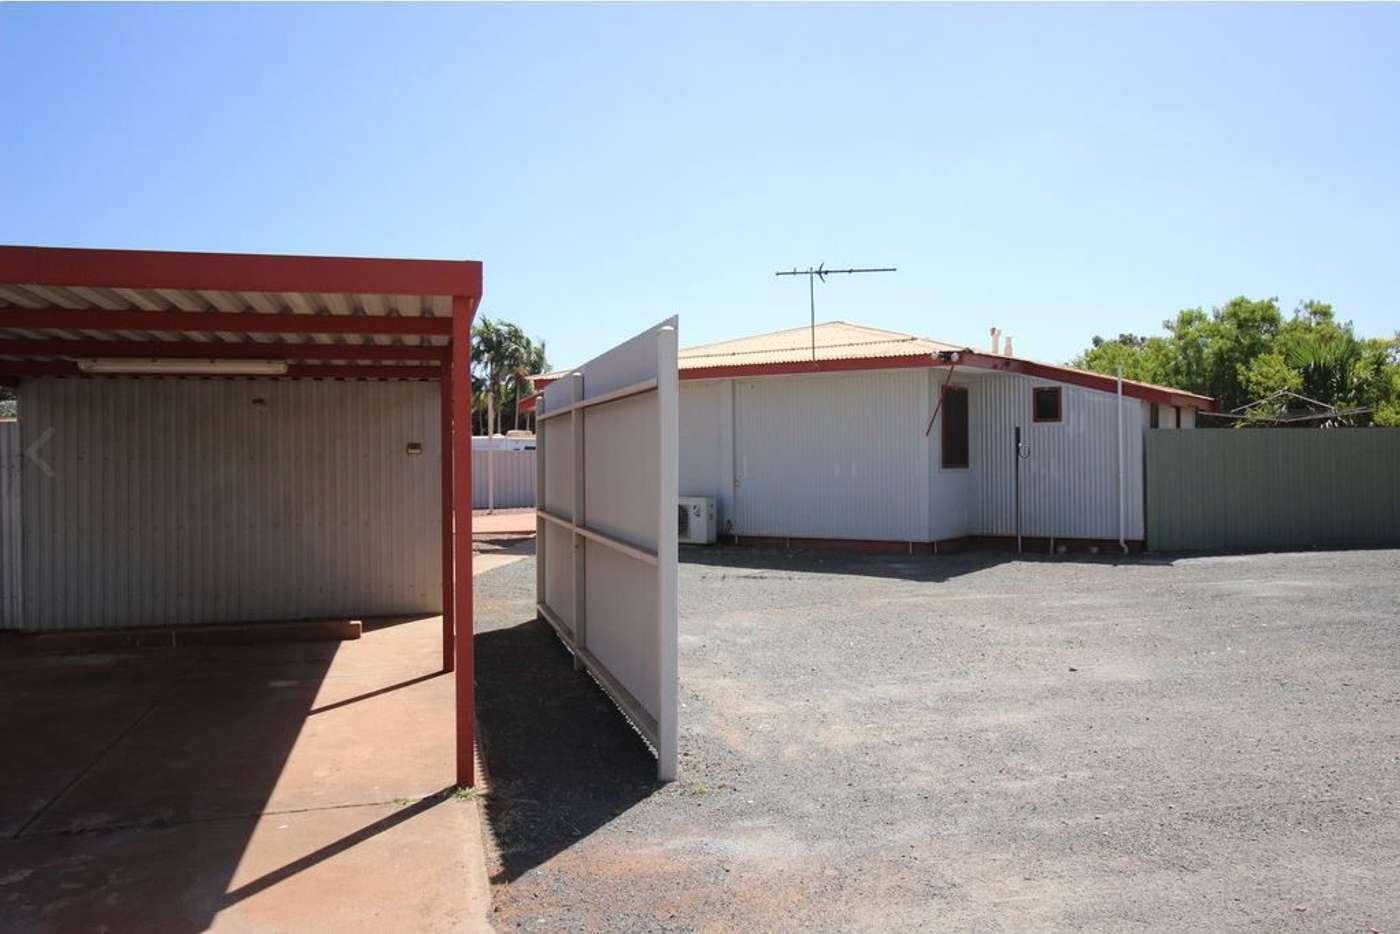 Main view of Homely house listing, 33 Pedlar Street, South Hedland WA 6722